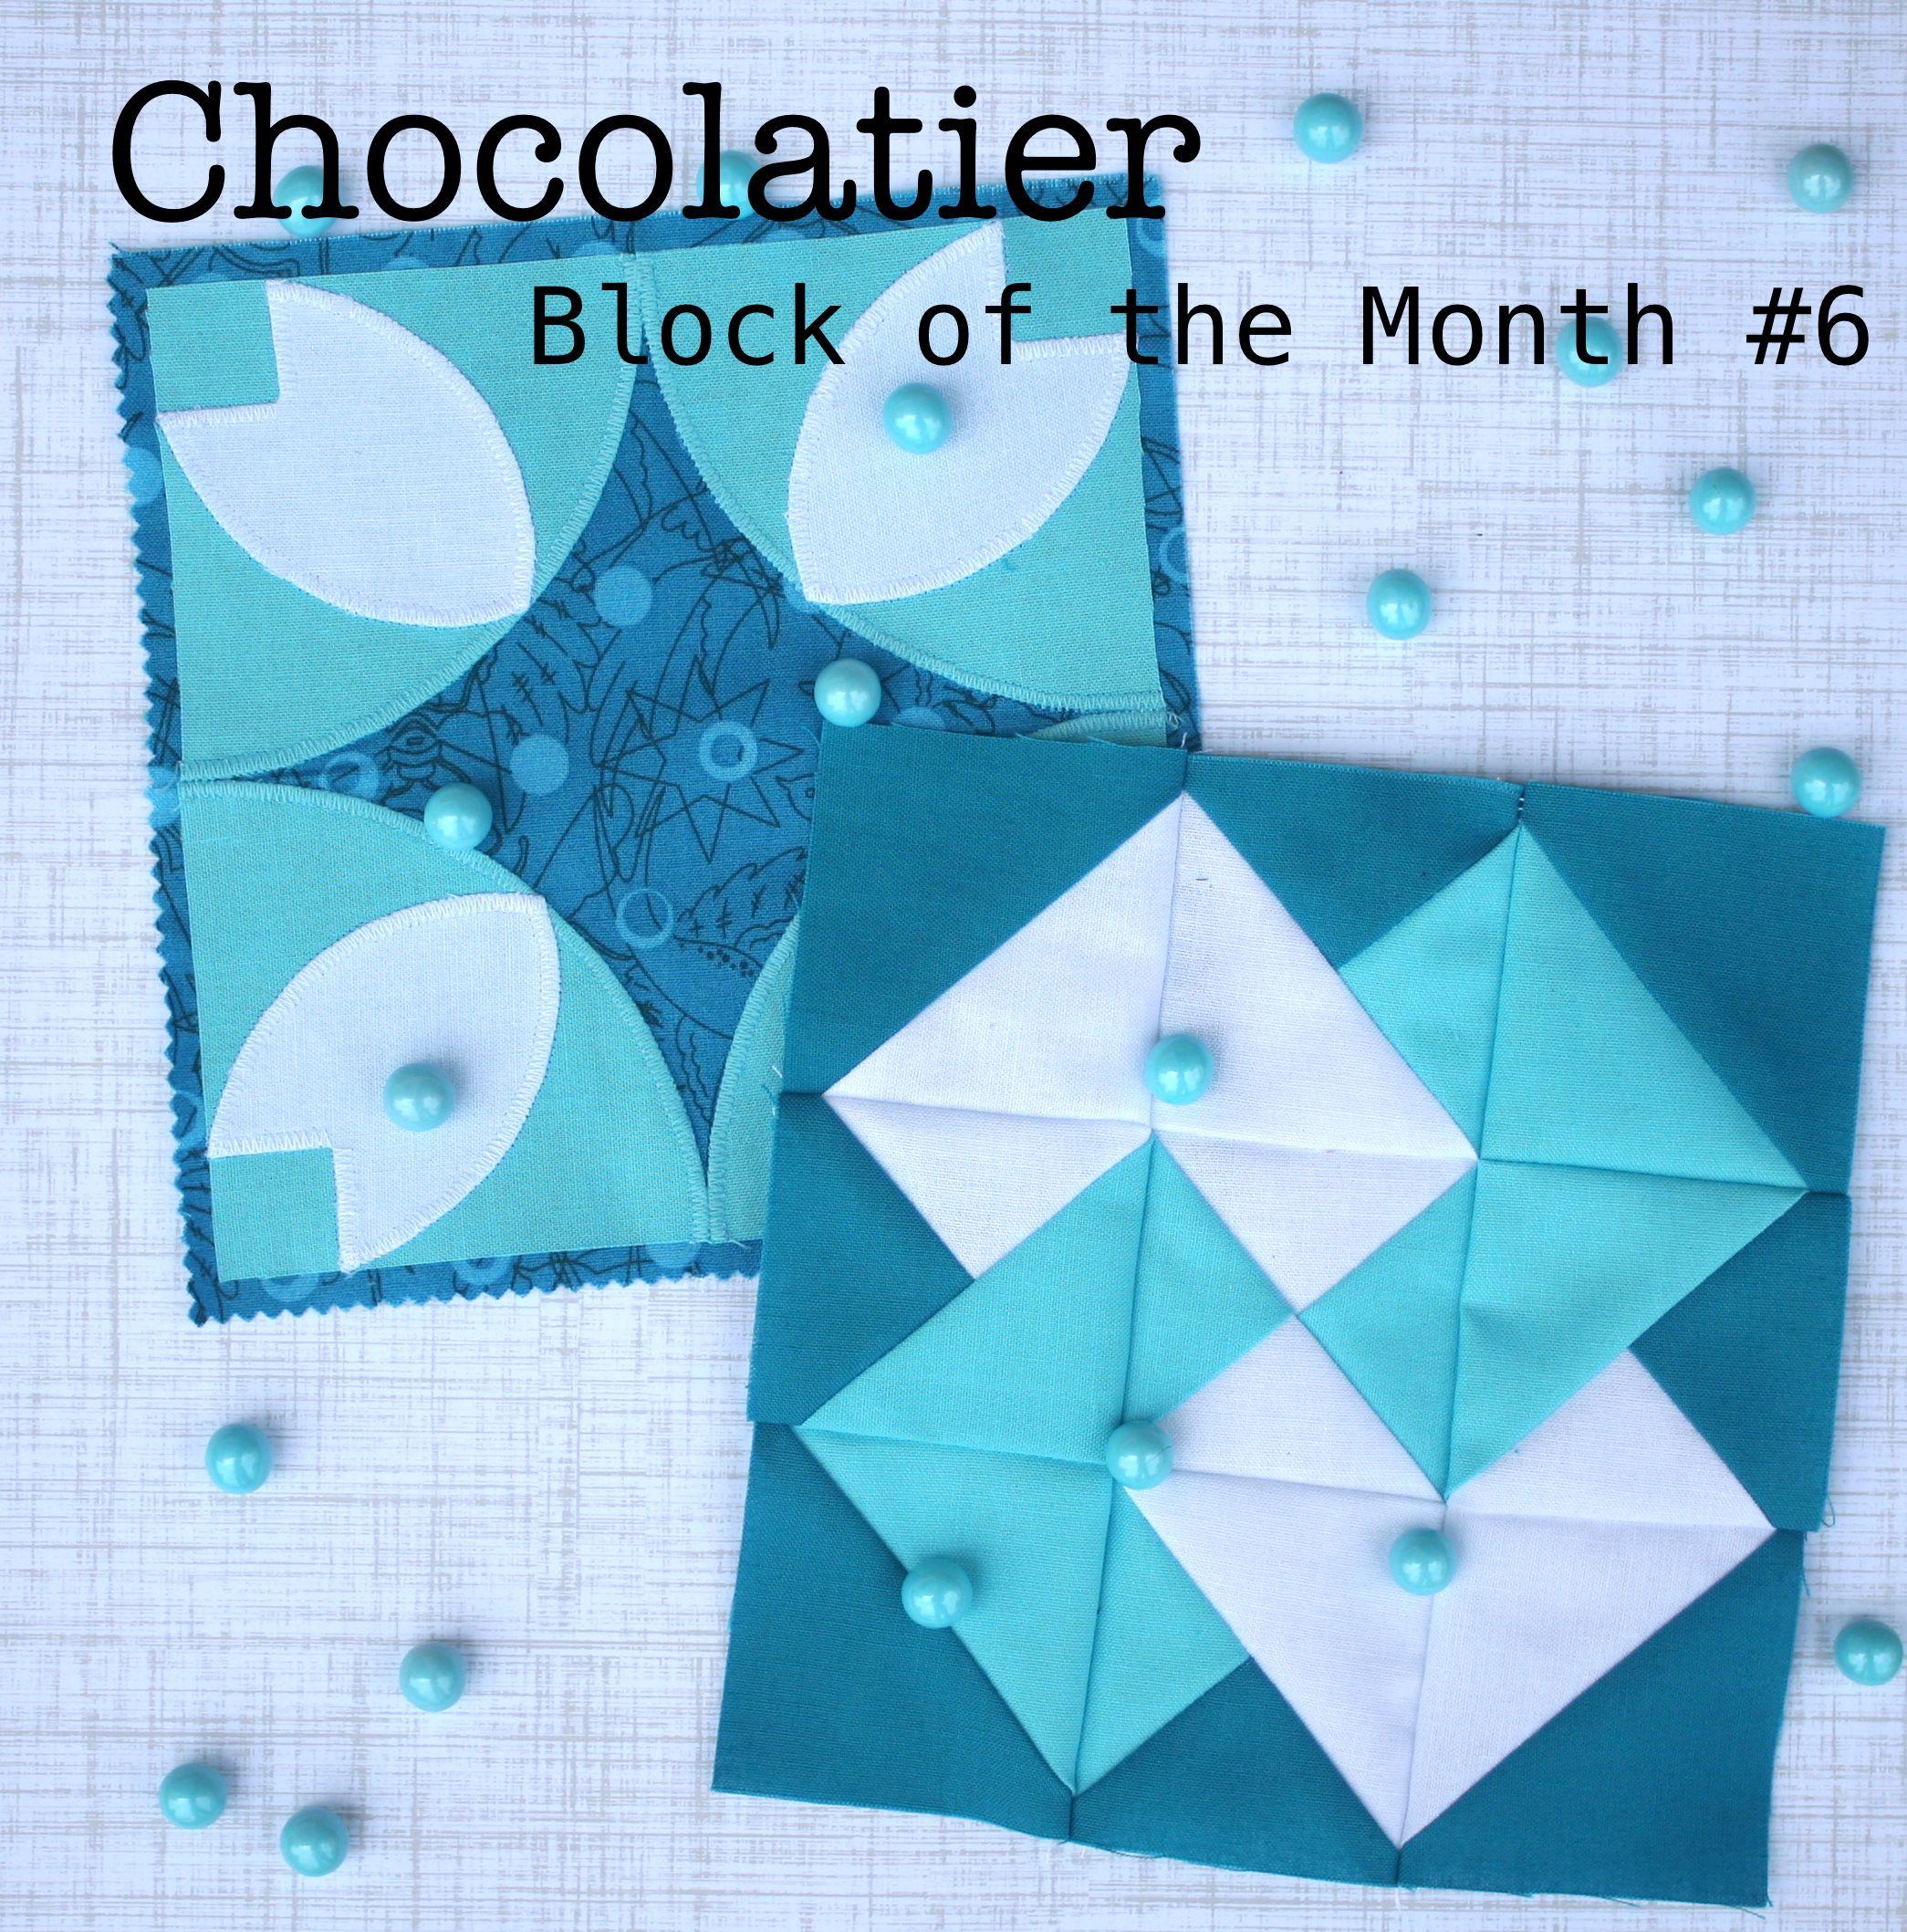 Gen X Quilters   Quilt Inspiration | Quilting Tutorials U0026 Patterns | Connect:  Chocolatier Block